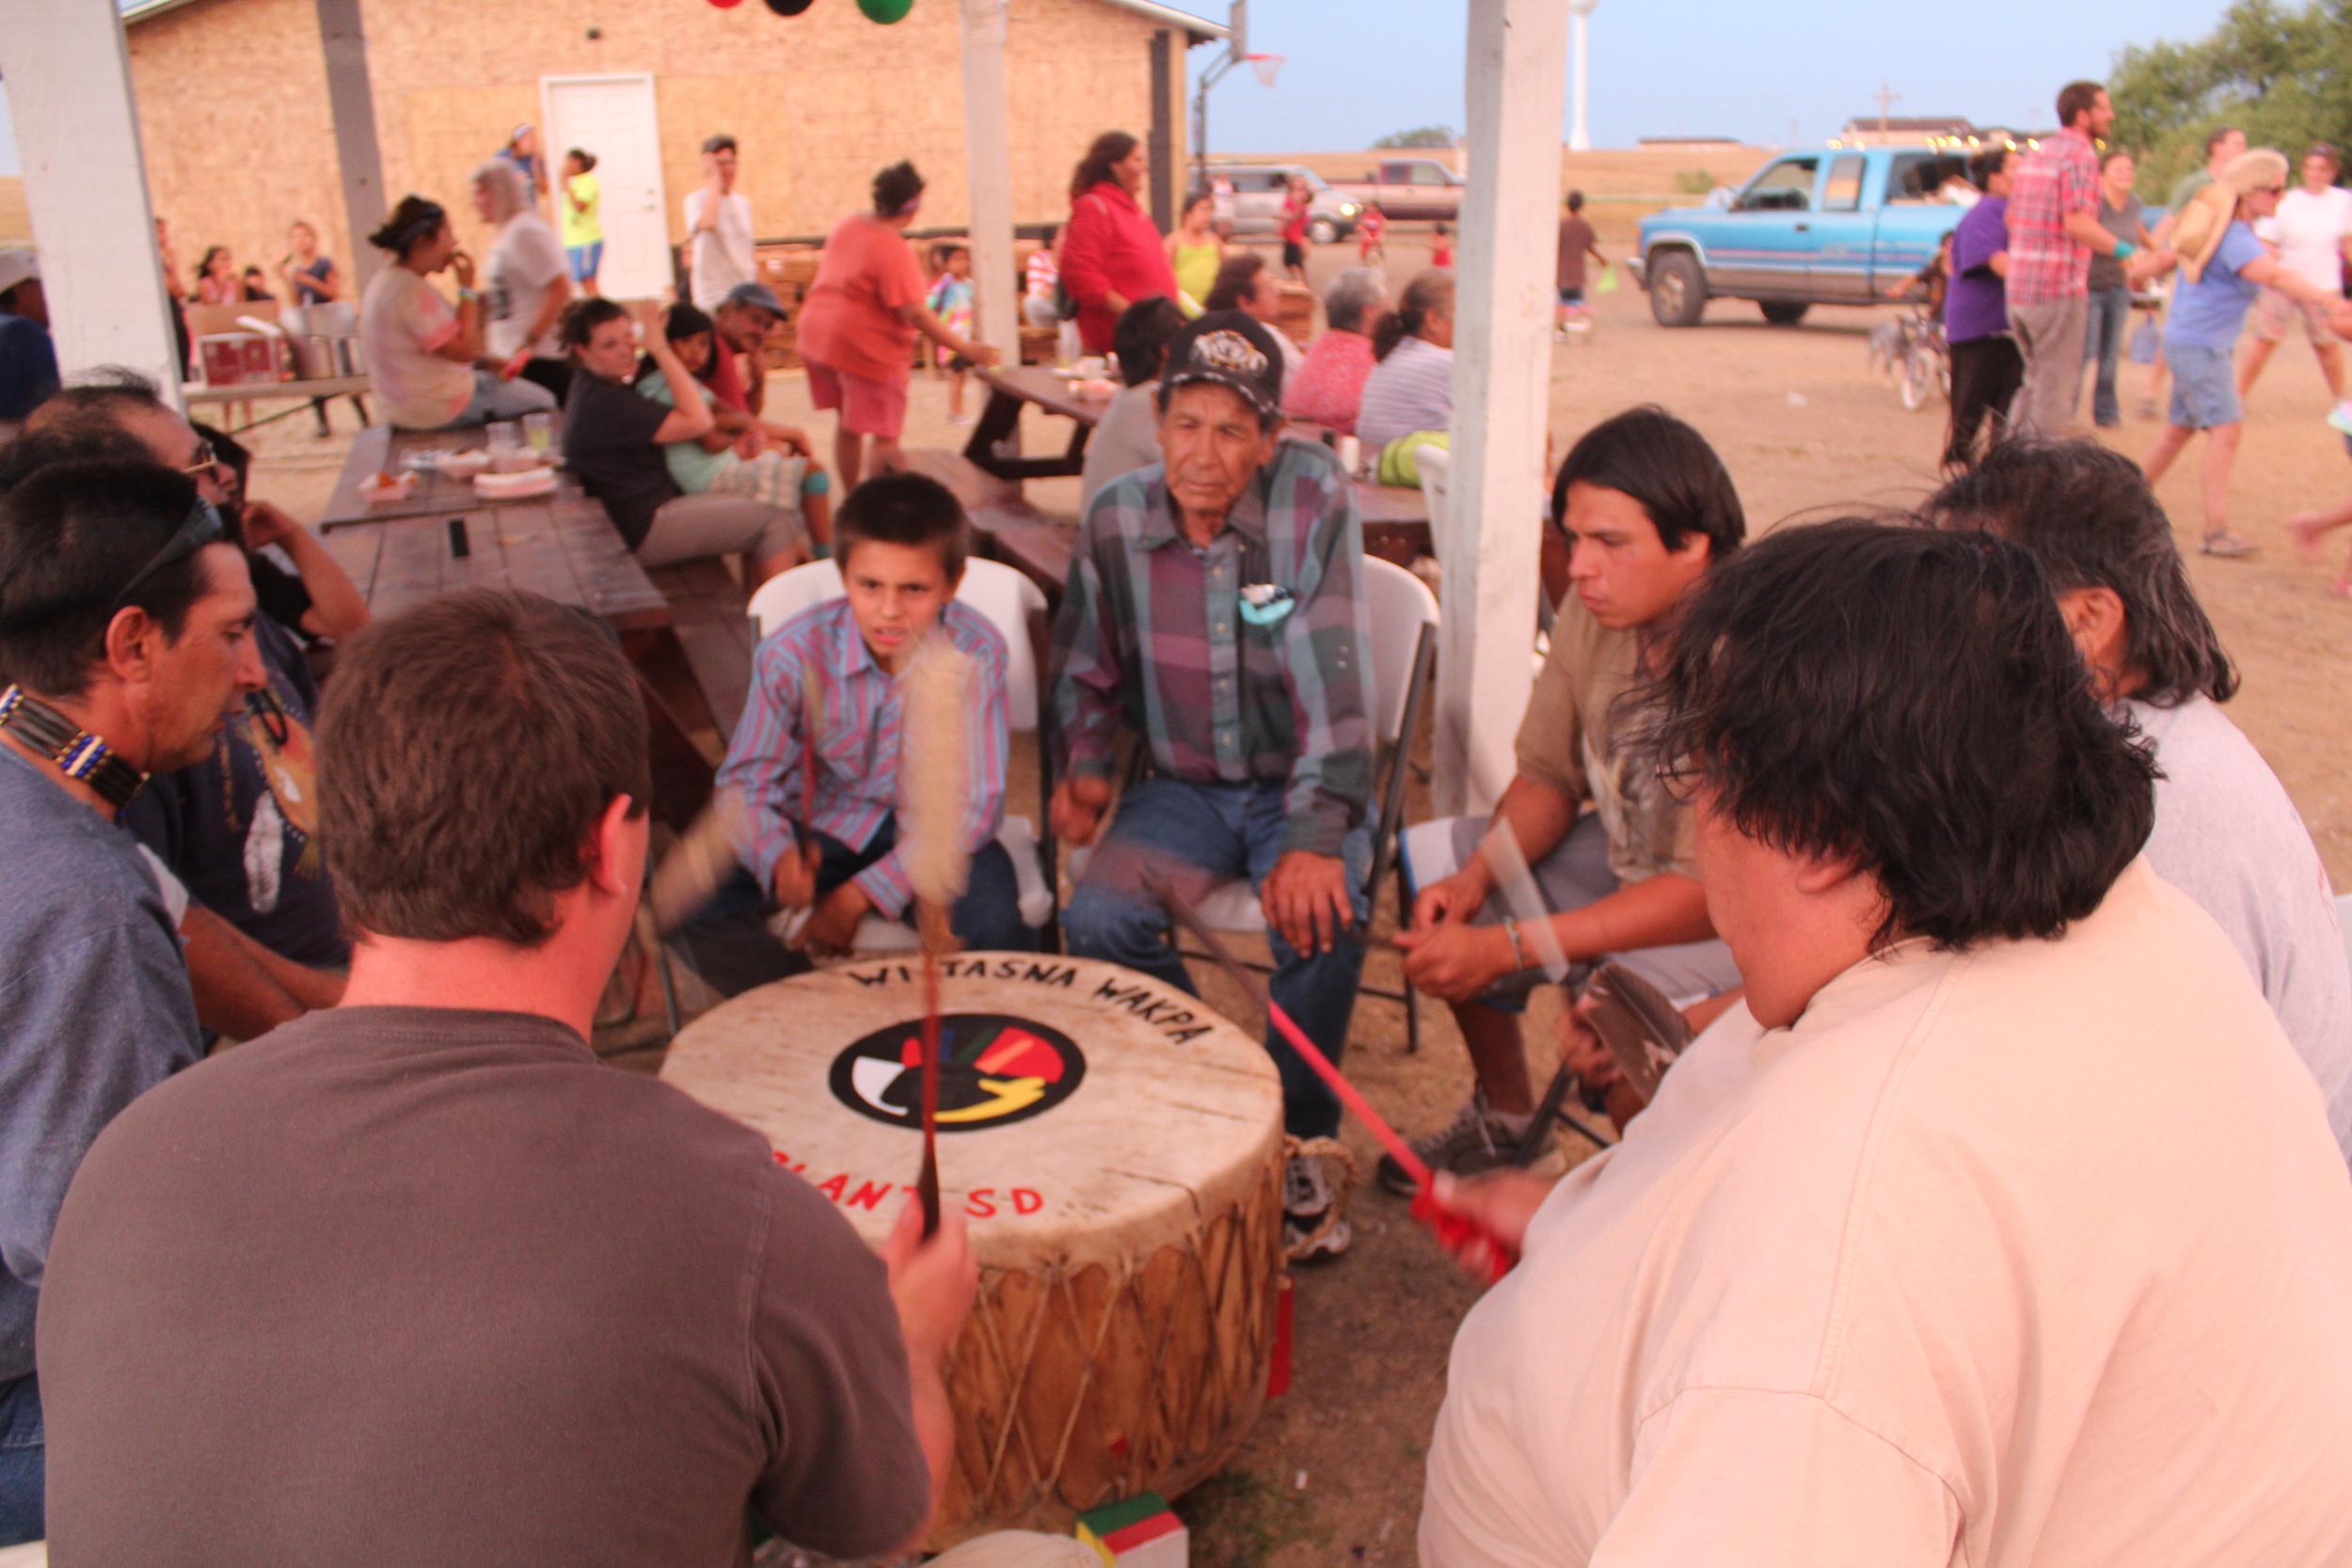 Weekly drum circles preserve oral history through music